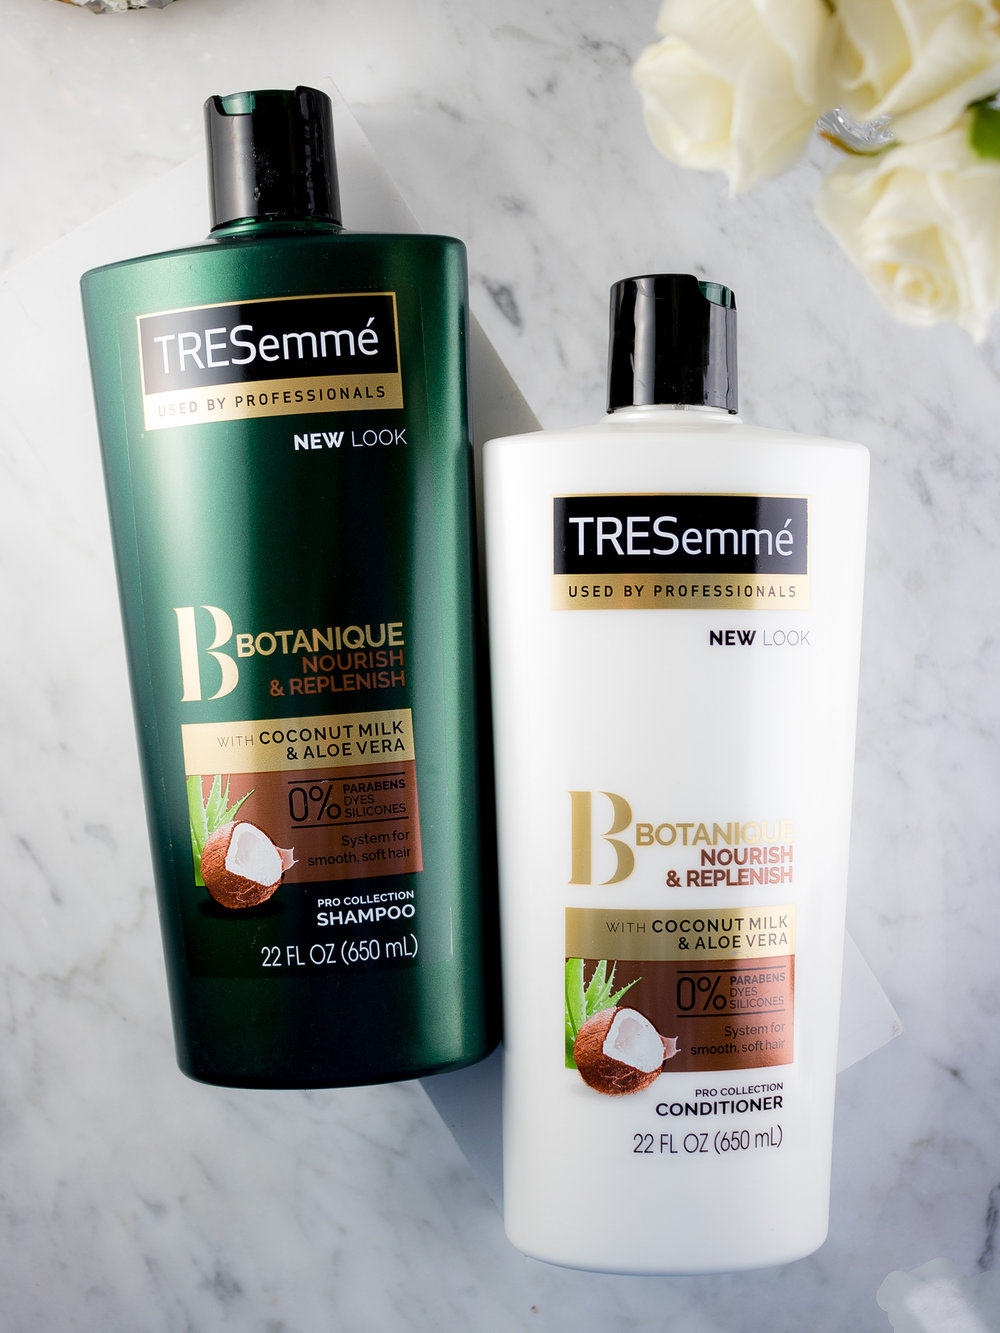 Botanique Nourish & Replenish with Coconut Milk & Aloe Vera Shampoo and Conditioner